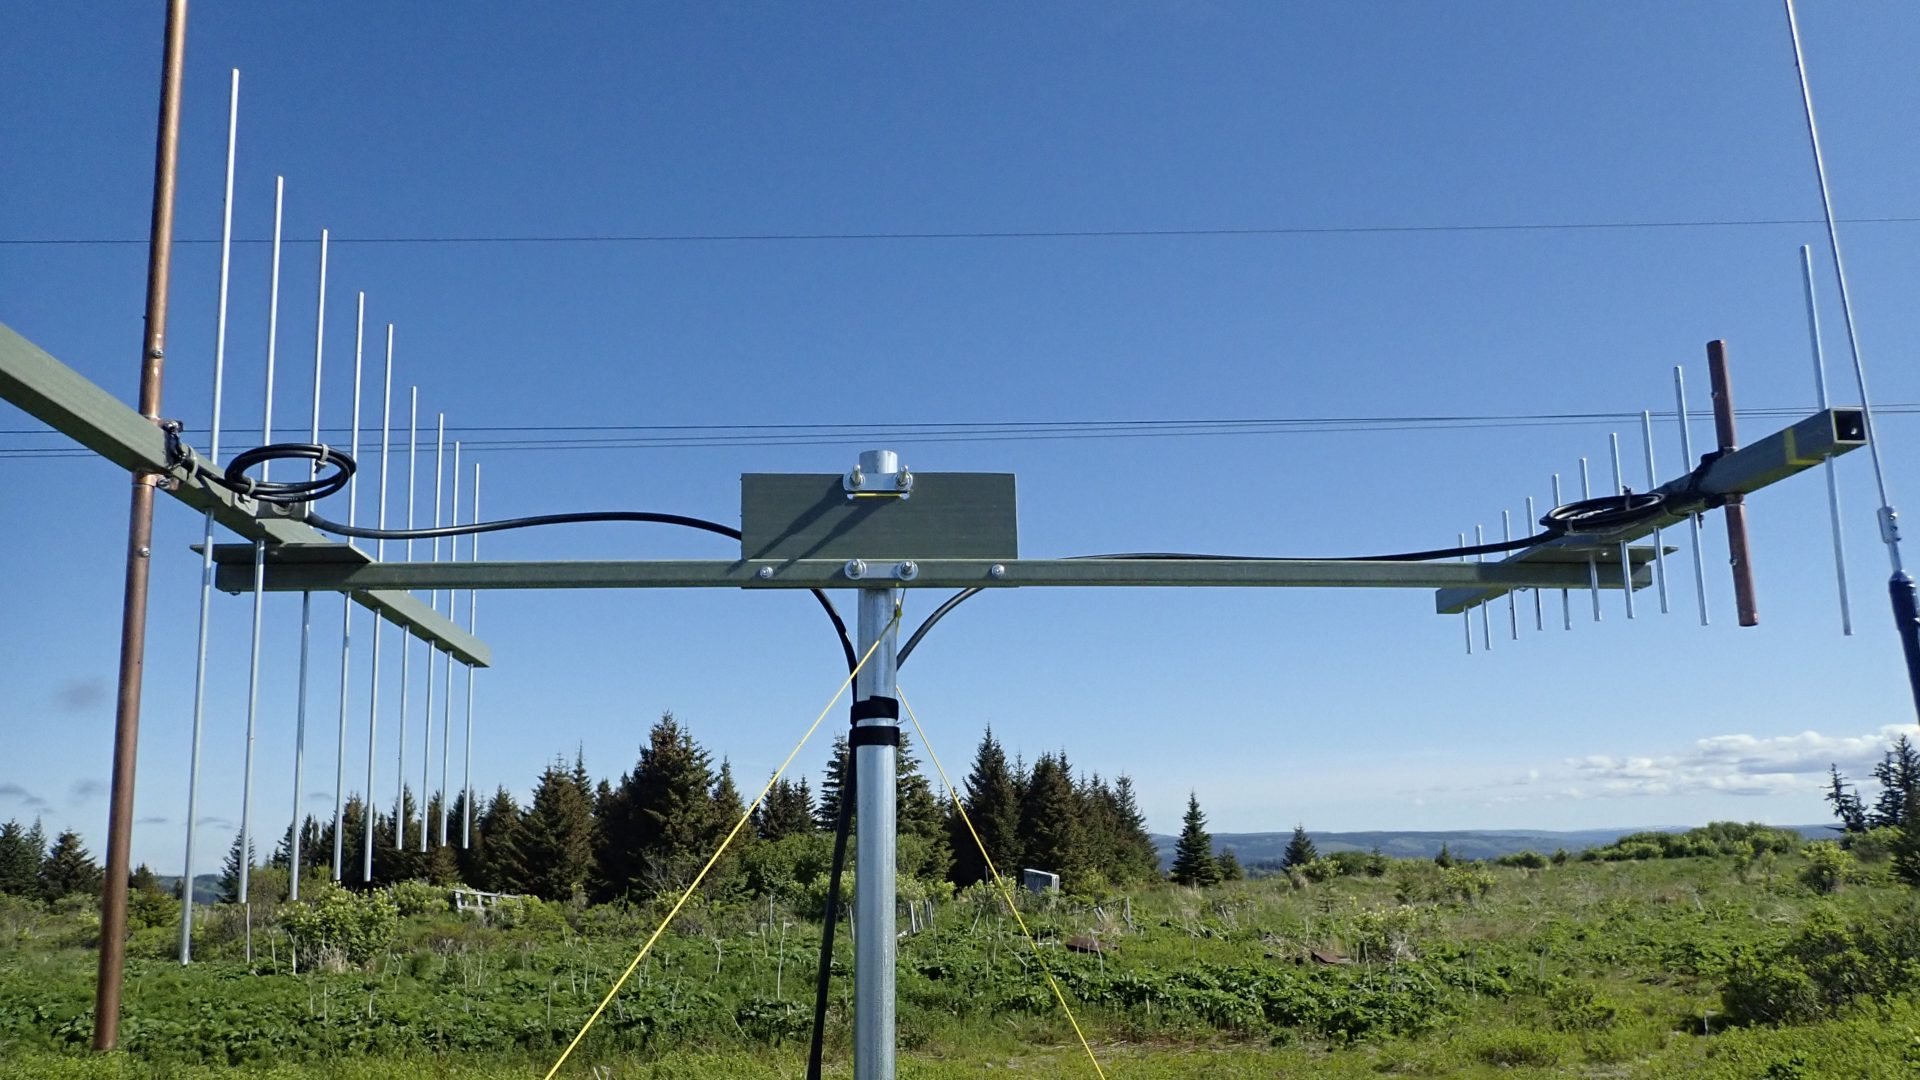 Rover antennas looking towards Anchorage